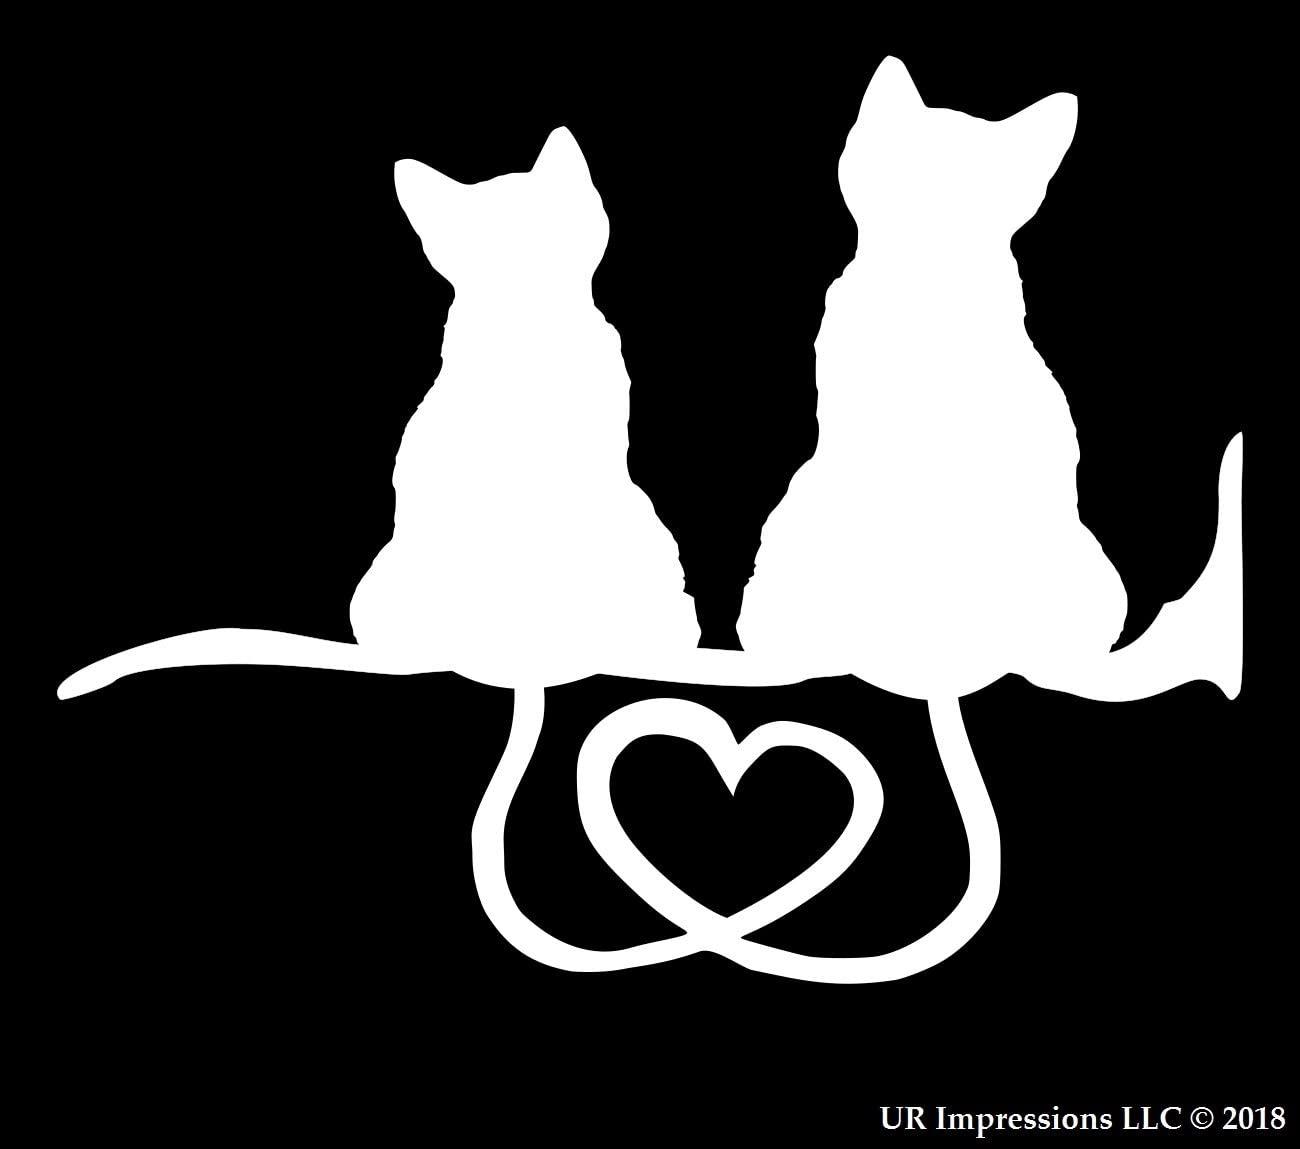 UR Impressions Kitty Cat Heart Tails Decal Vinyl Sticker Graphics for Cars Trucks SUV Vans Walls Windows Laptop|White|5.5 X 3.5 Inch|URI143